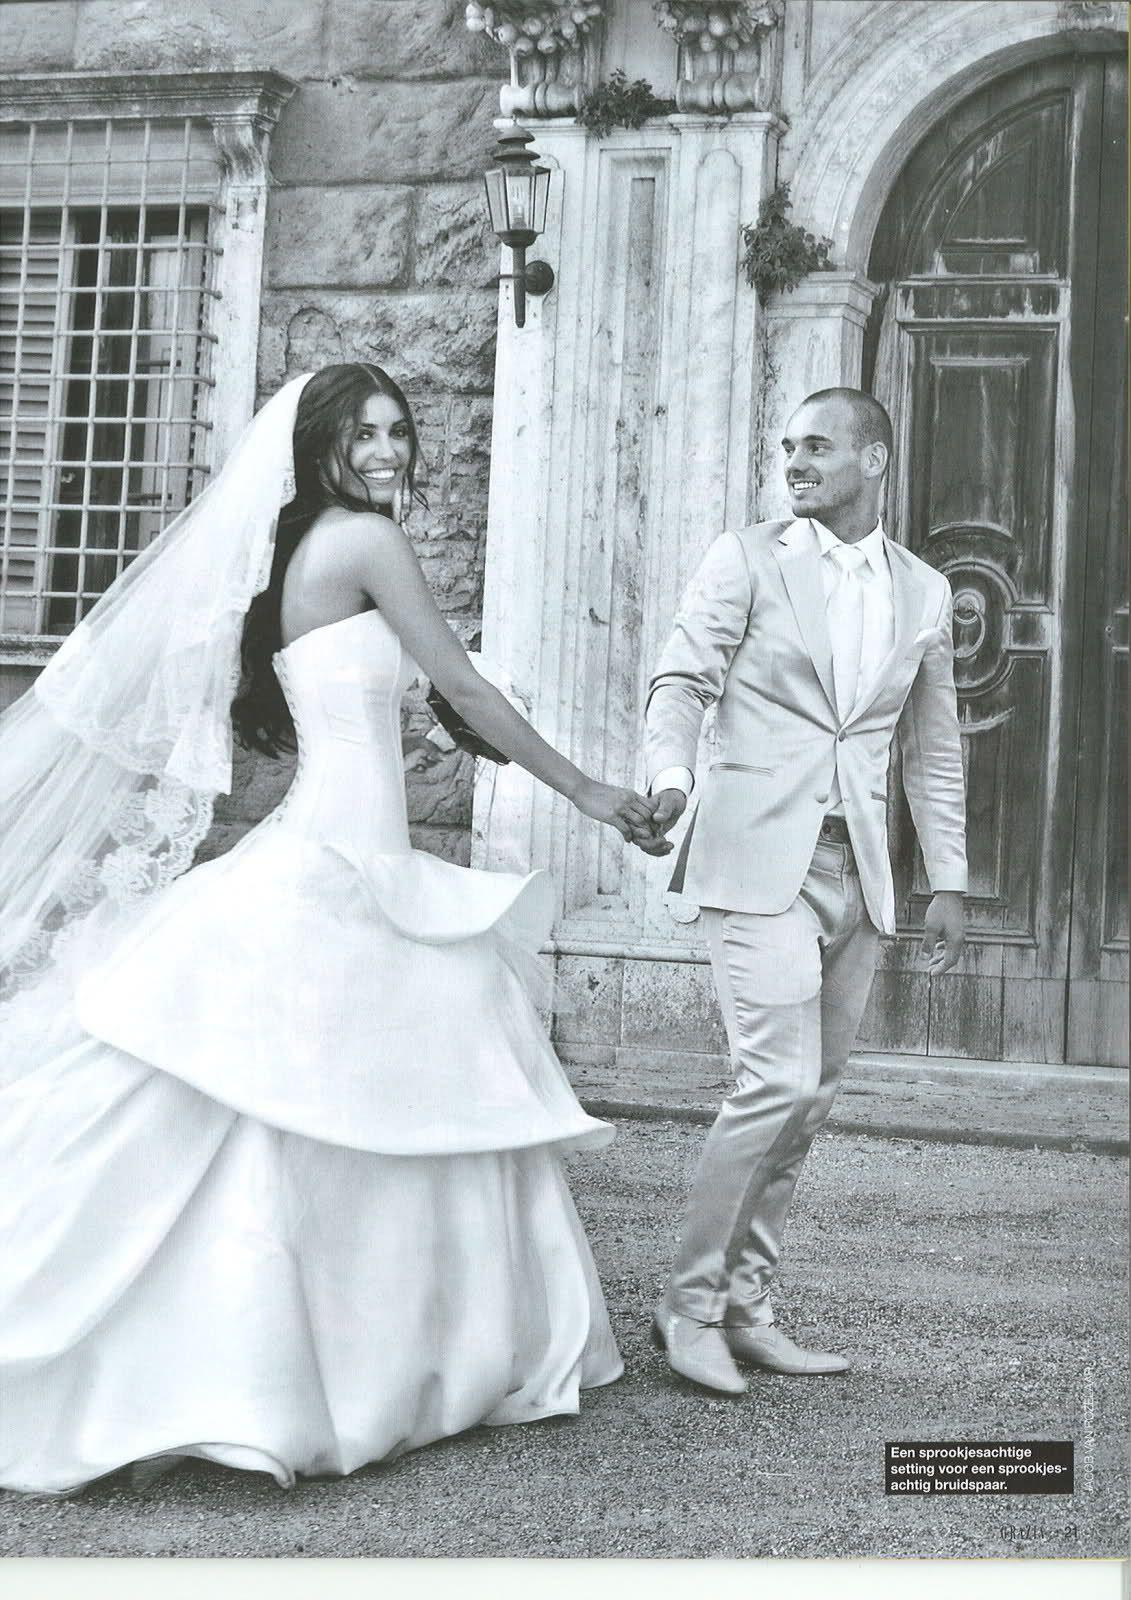 Trouwjurk Borsato.Wesley Sneijder En Yolanthe Sneijder Cabau Mary Borsato